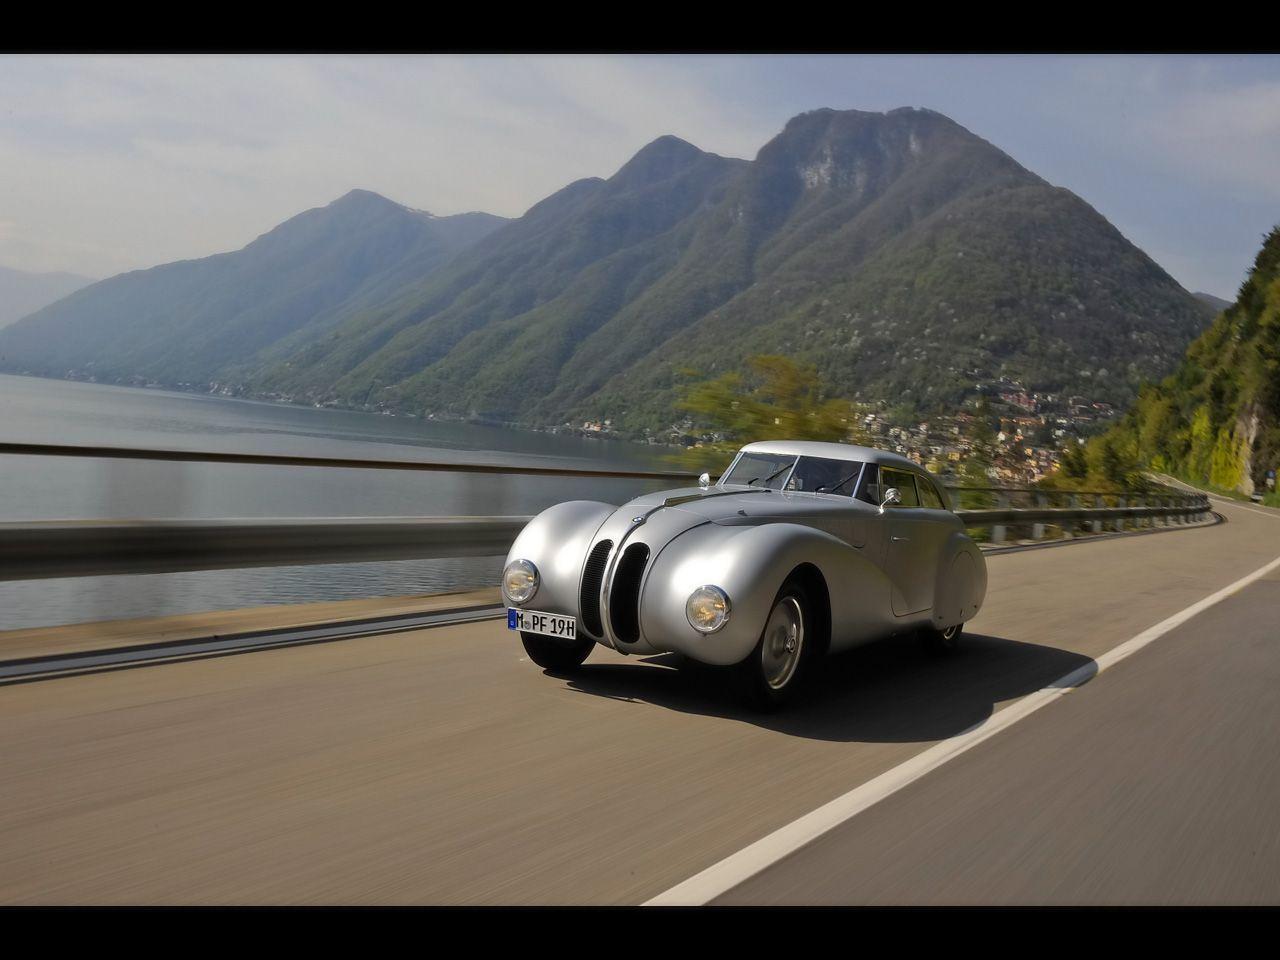 1940 BMW 328 Kamm Coupe | BMW | Pinterest | Bmw 328, BMW and Vehicle